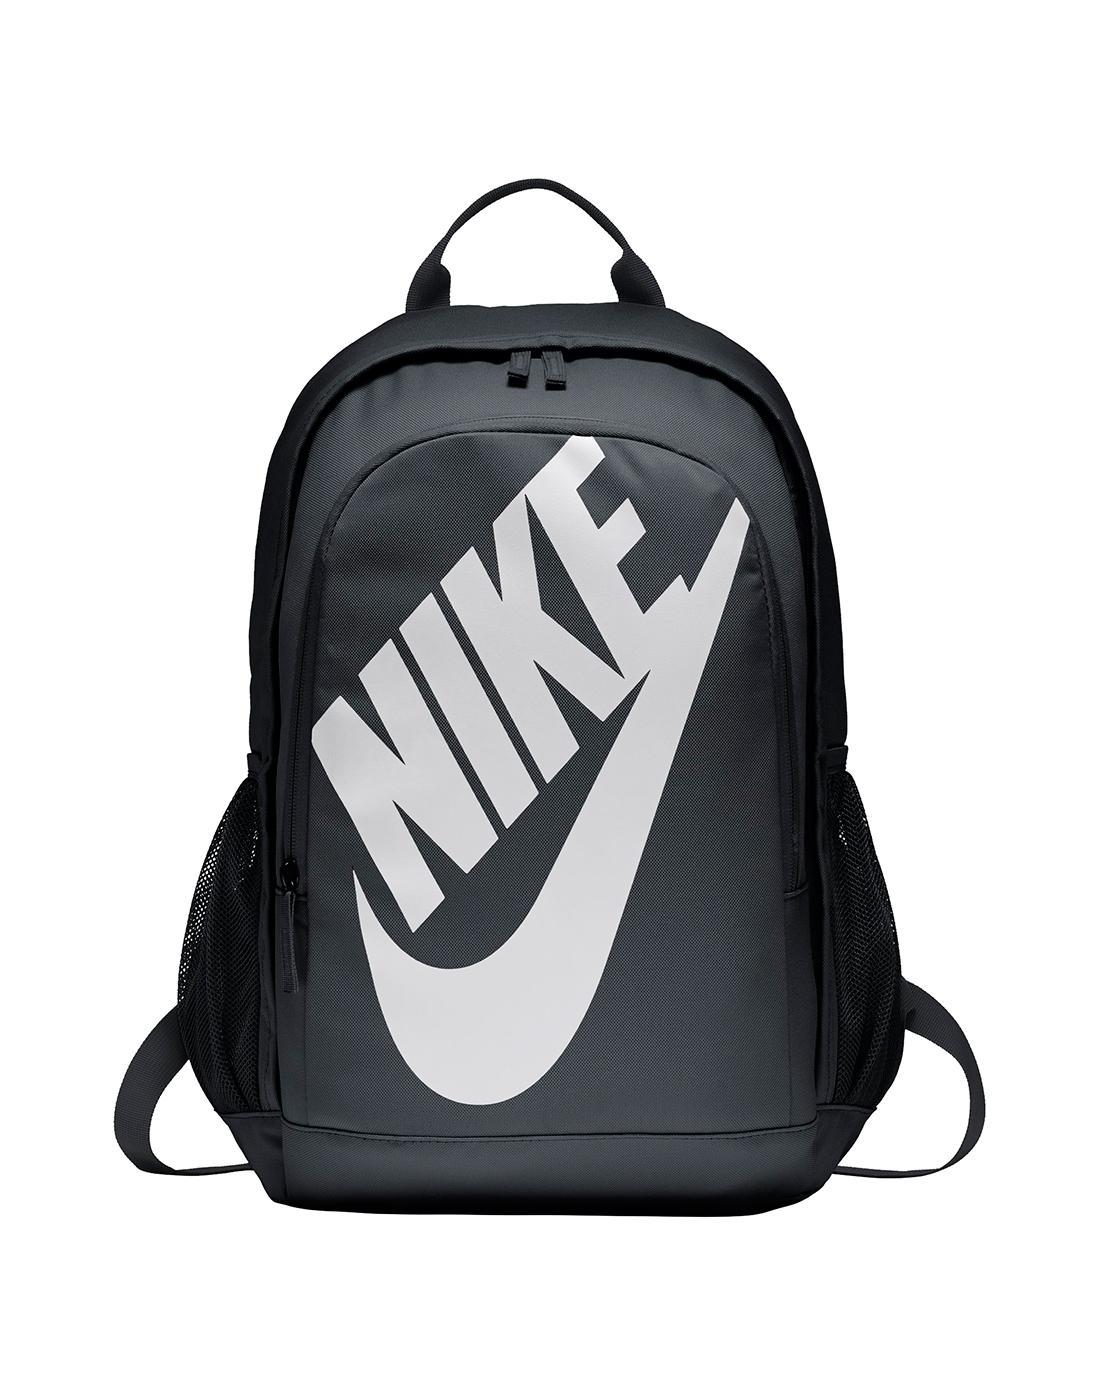 7b0314f678d8 Nike Hayward Futura Backpack